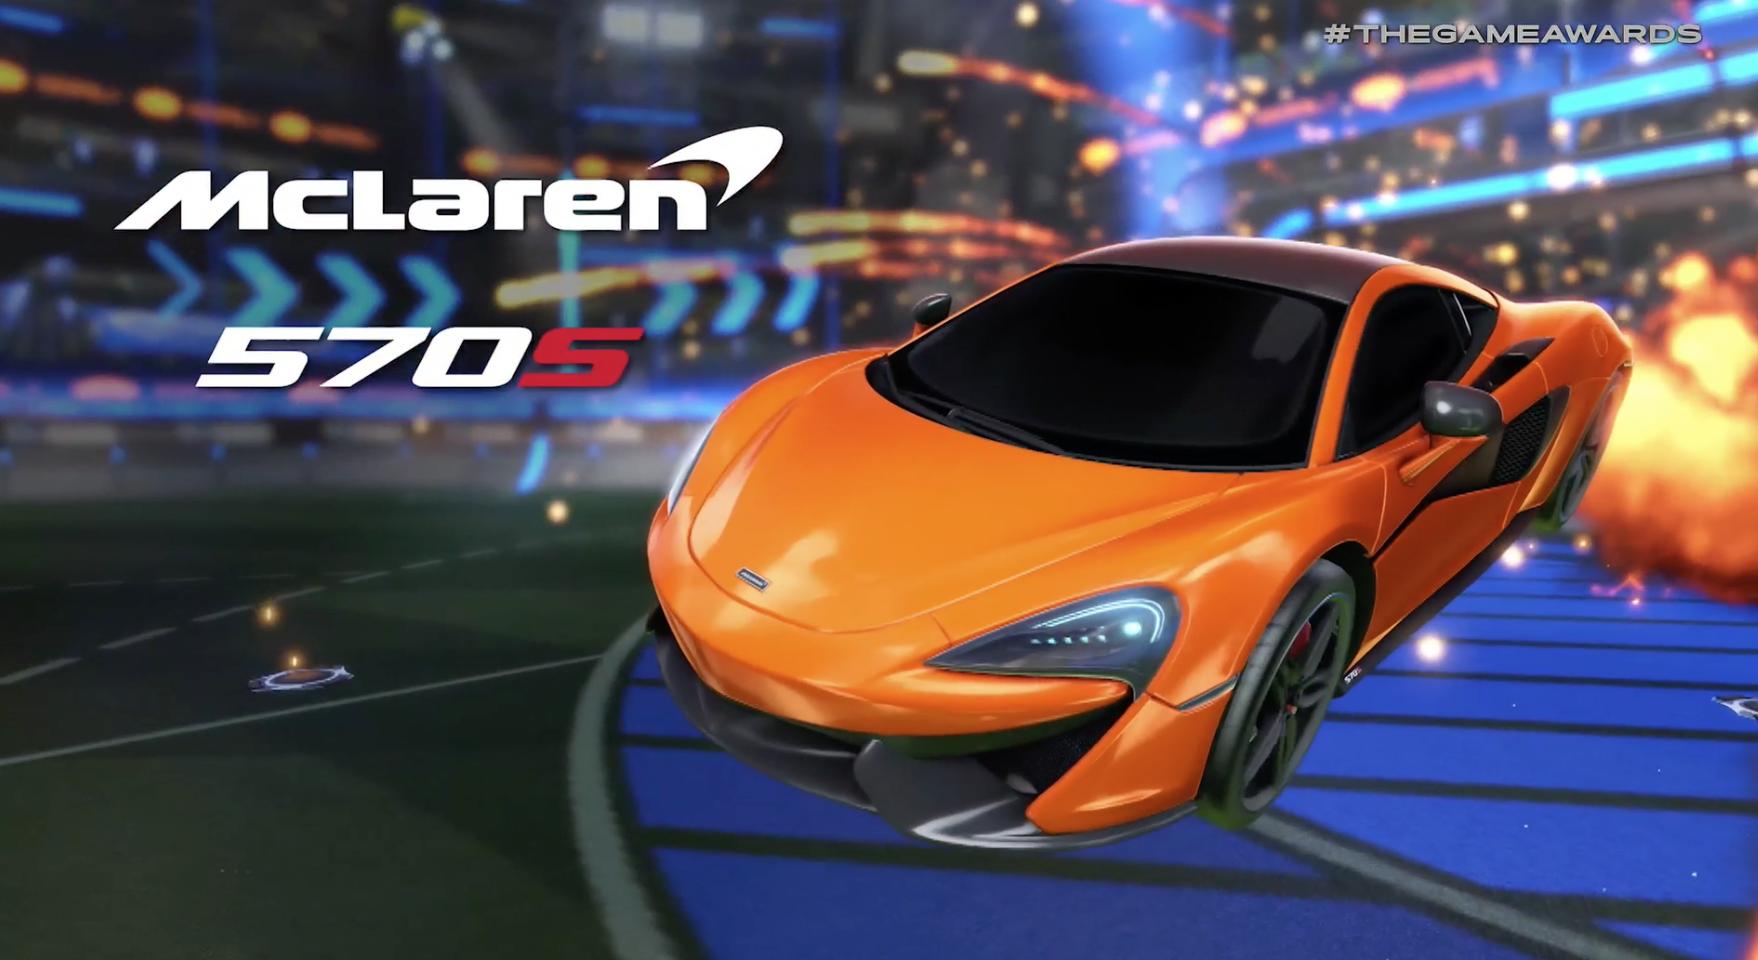 Rocket League Gets New Mclaren 570s Car Pack Variety